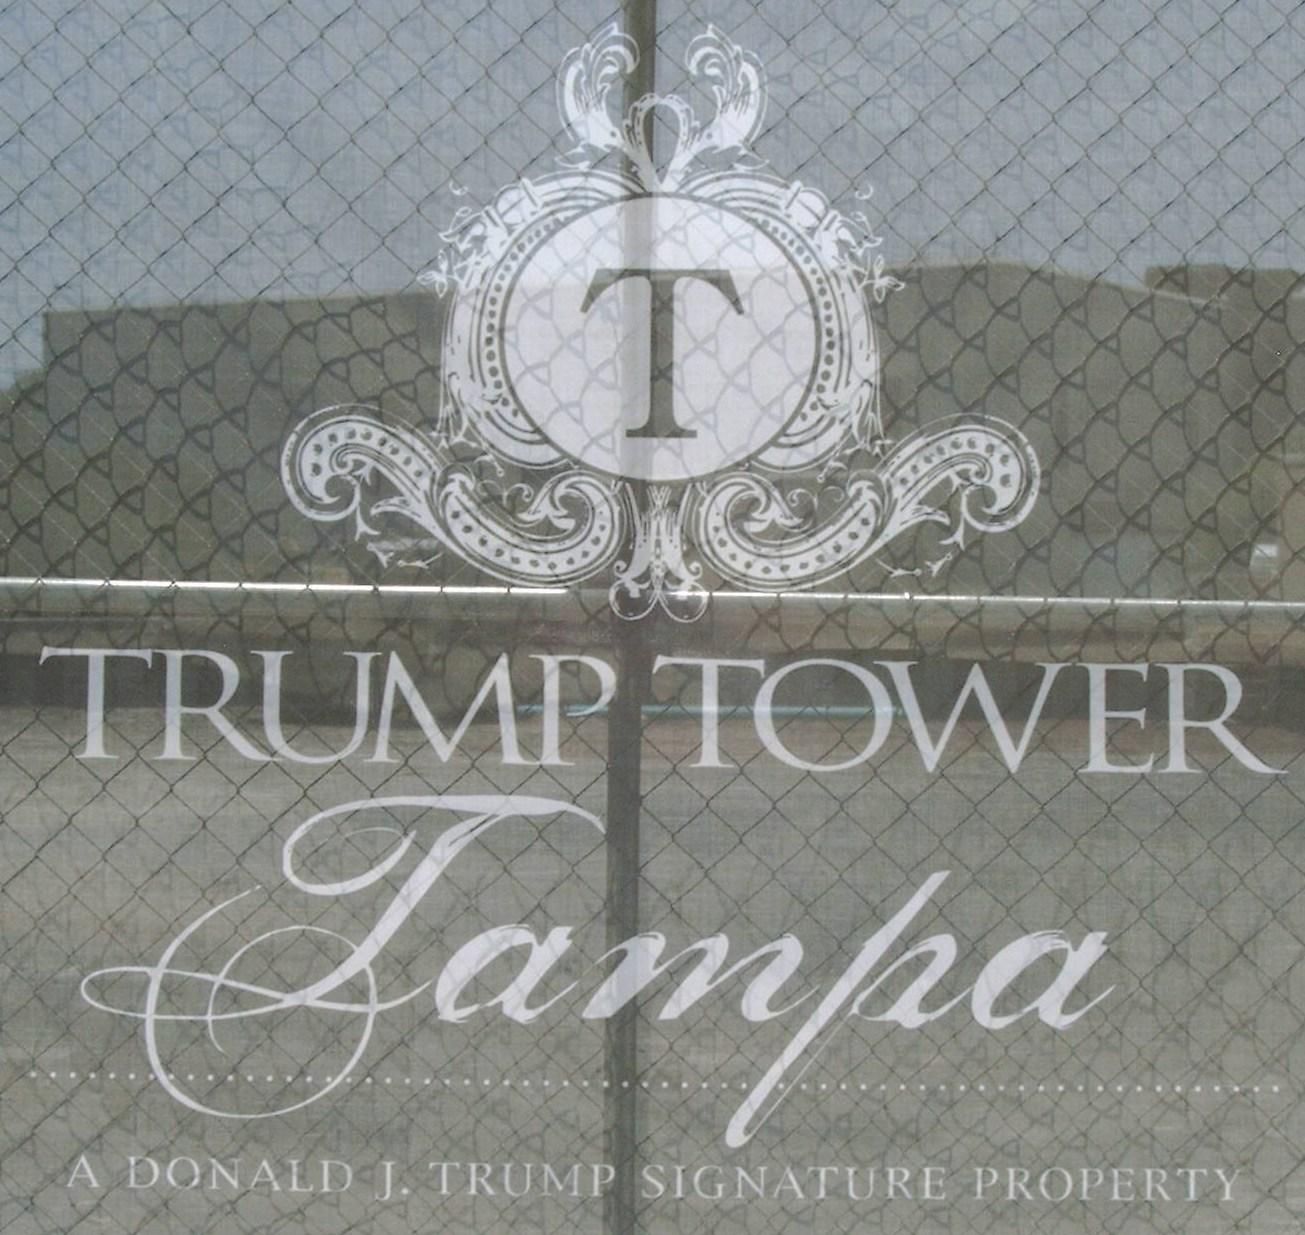 Trump Tower Tampa sign